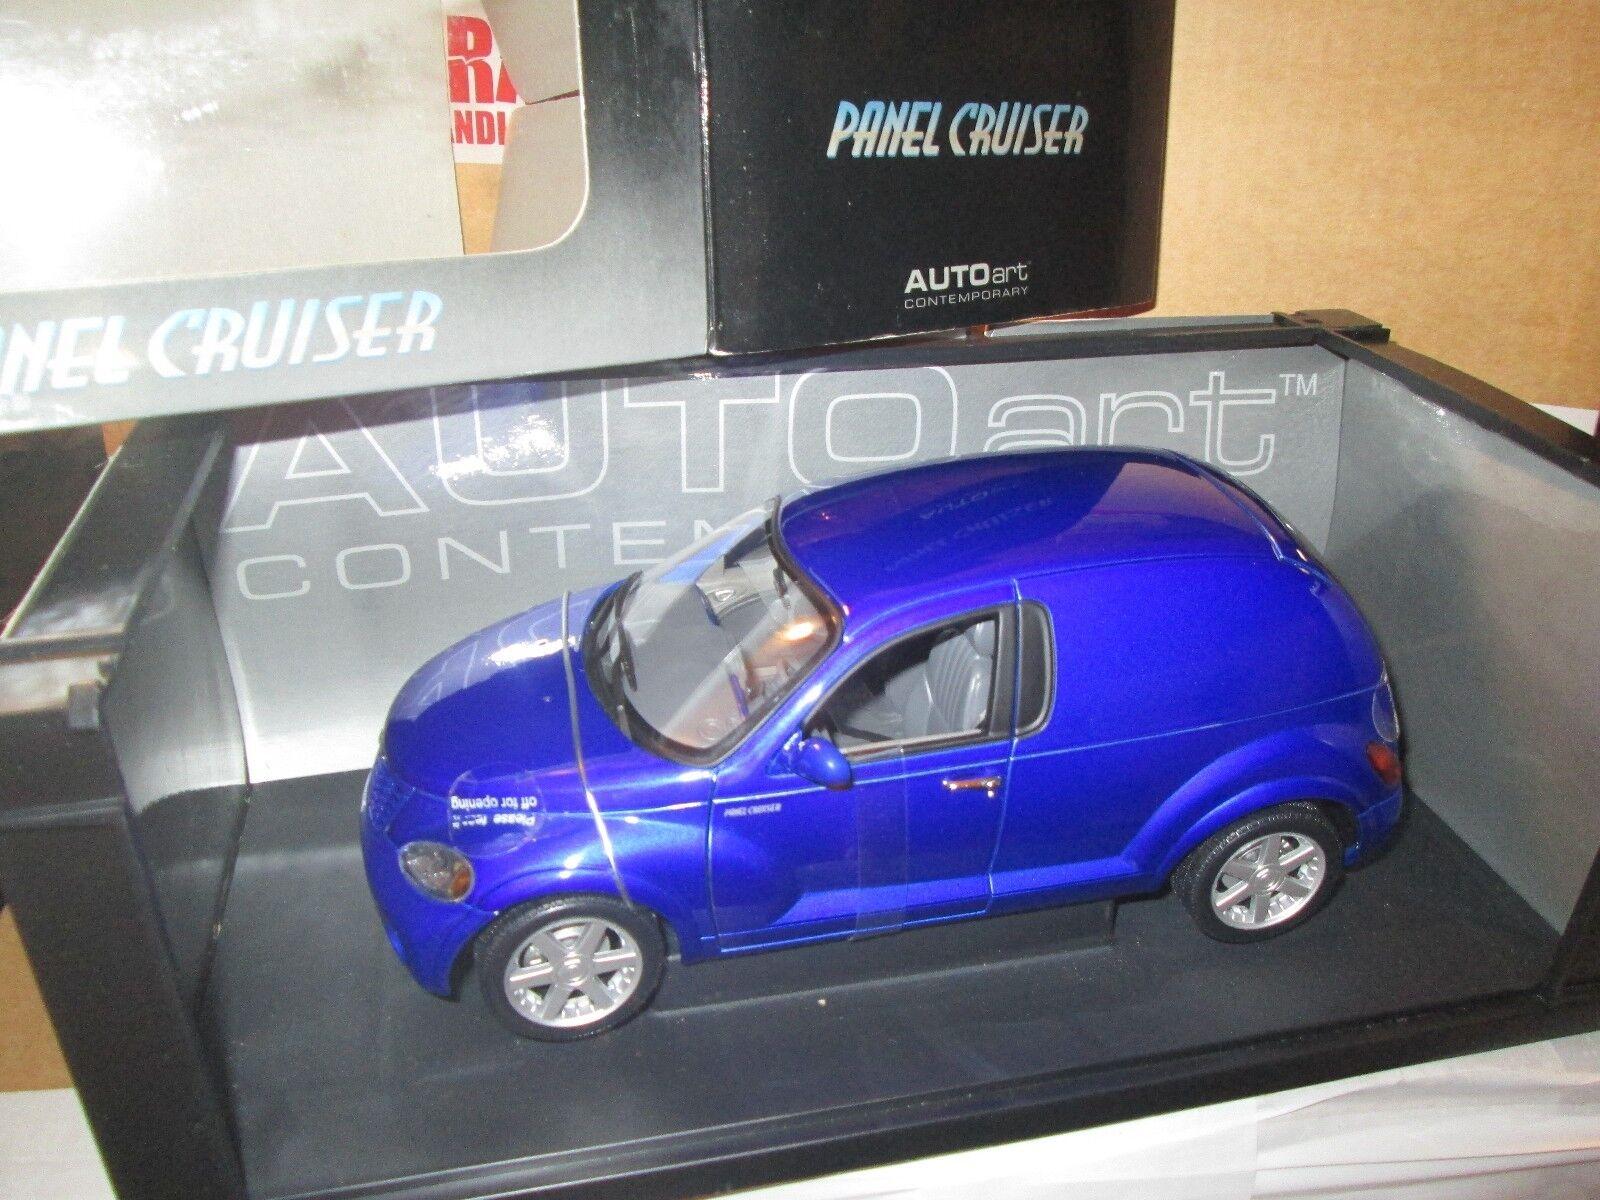 2001 AUTOart Play Toy Cruiser Chrysler bleu Panel 1 18 AUTO ART Diecast Voiture